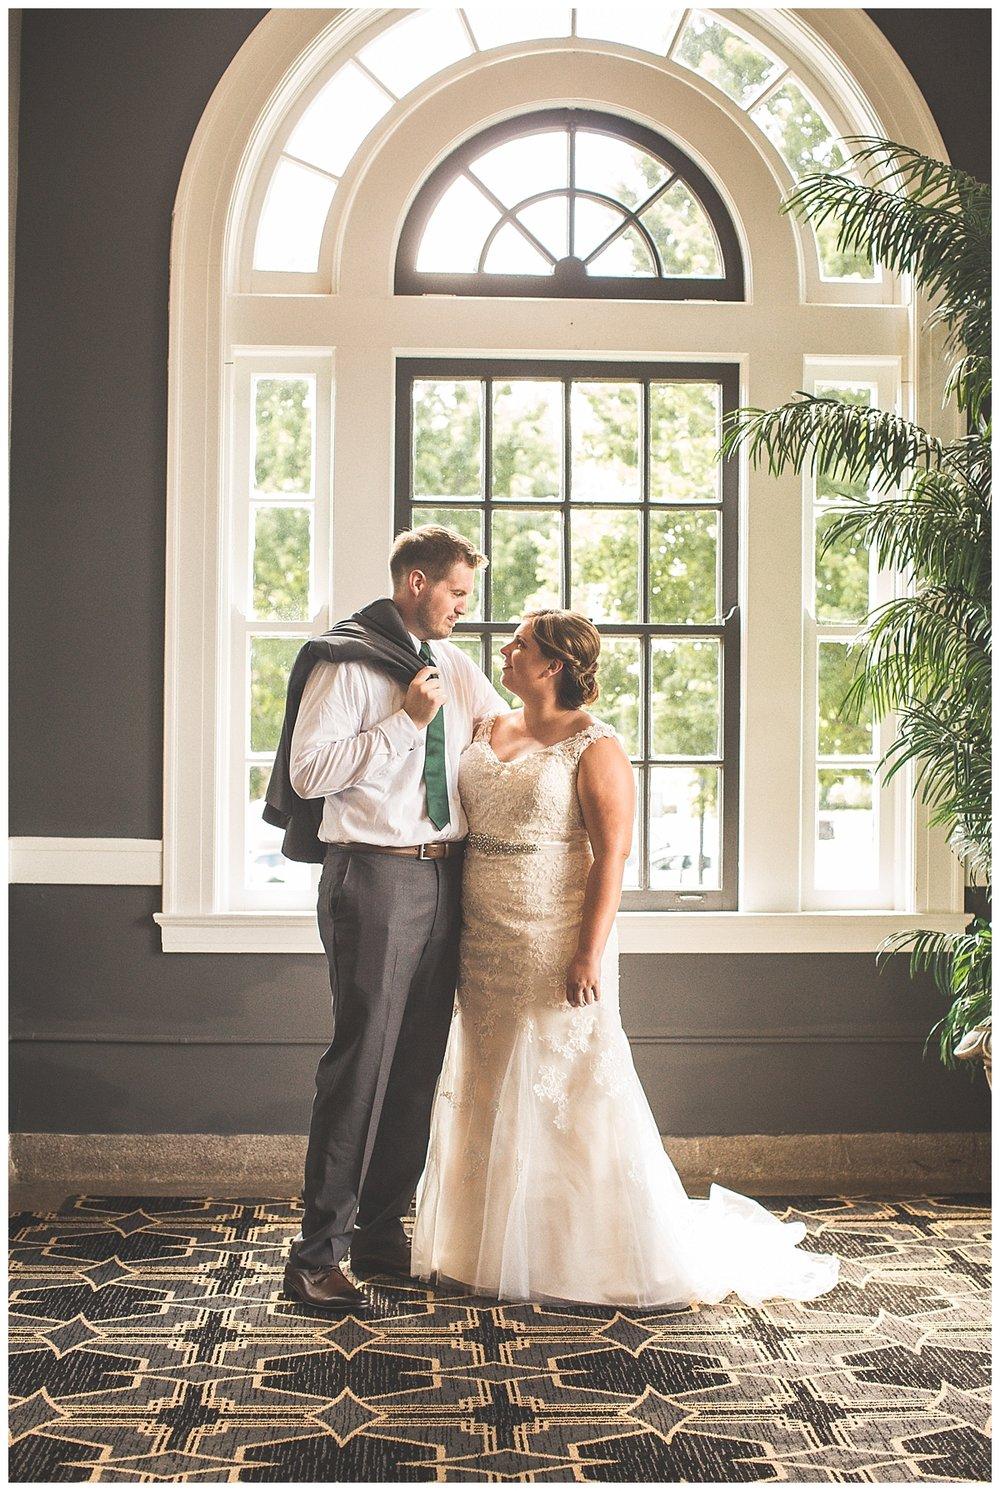 20180902-BridgetAdam-Wedding-blog-14.jpg